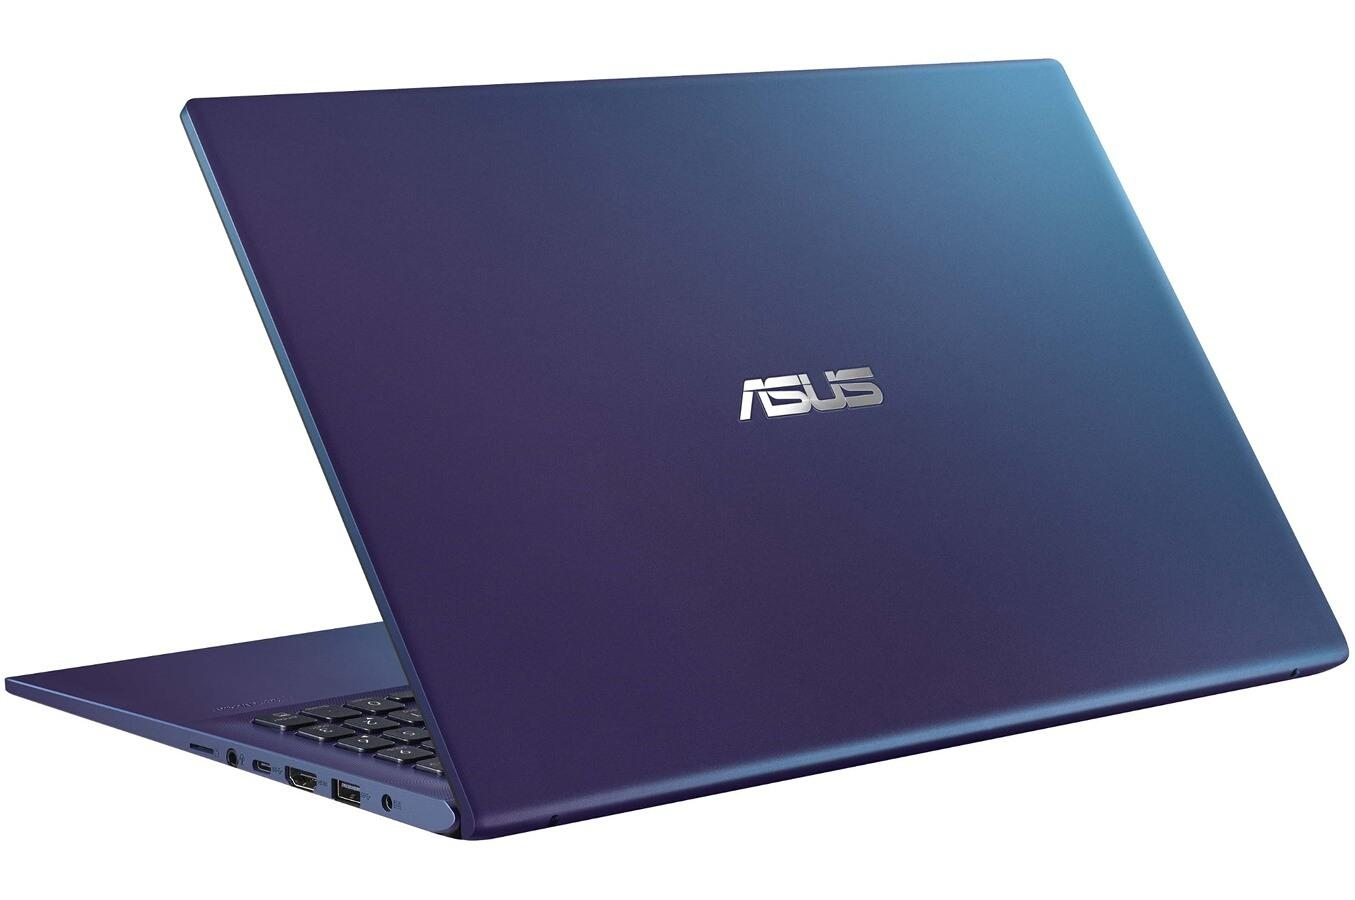 Ordinateur portable Asus VivoBook S512DA-EJ803T Bleu - Ryzen 3, SSD 512 Go - photo 3